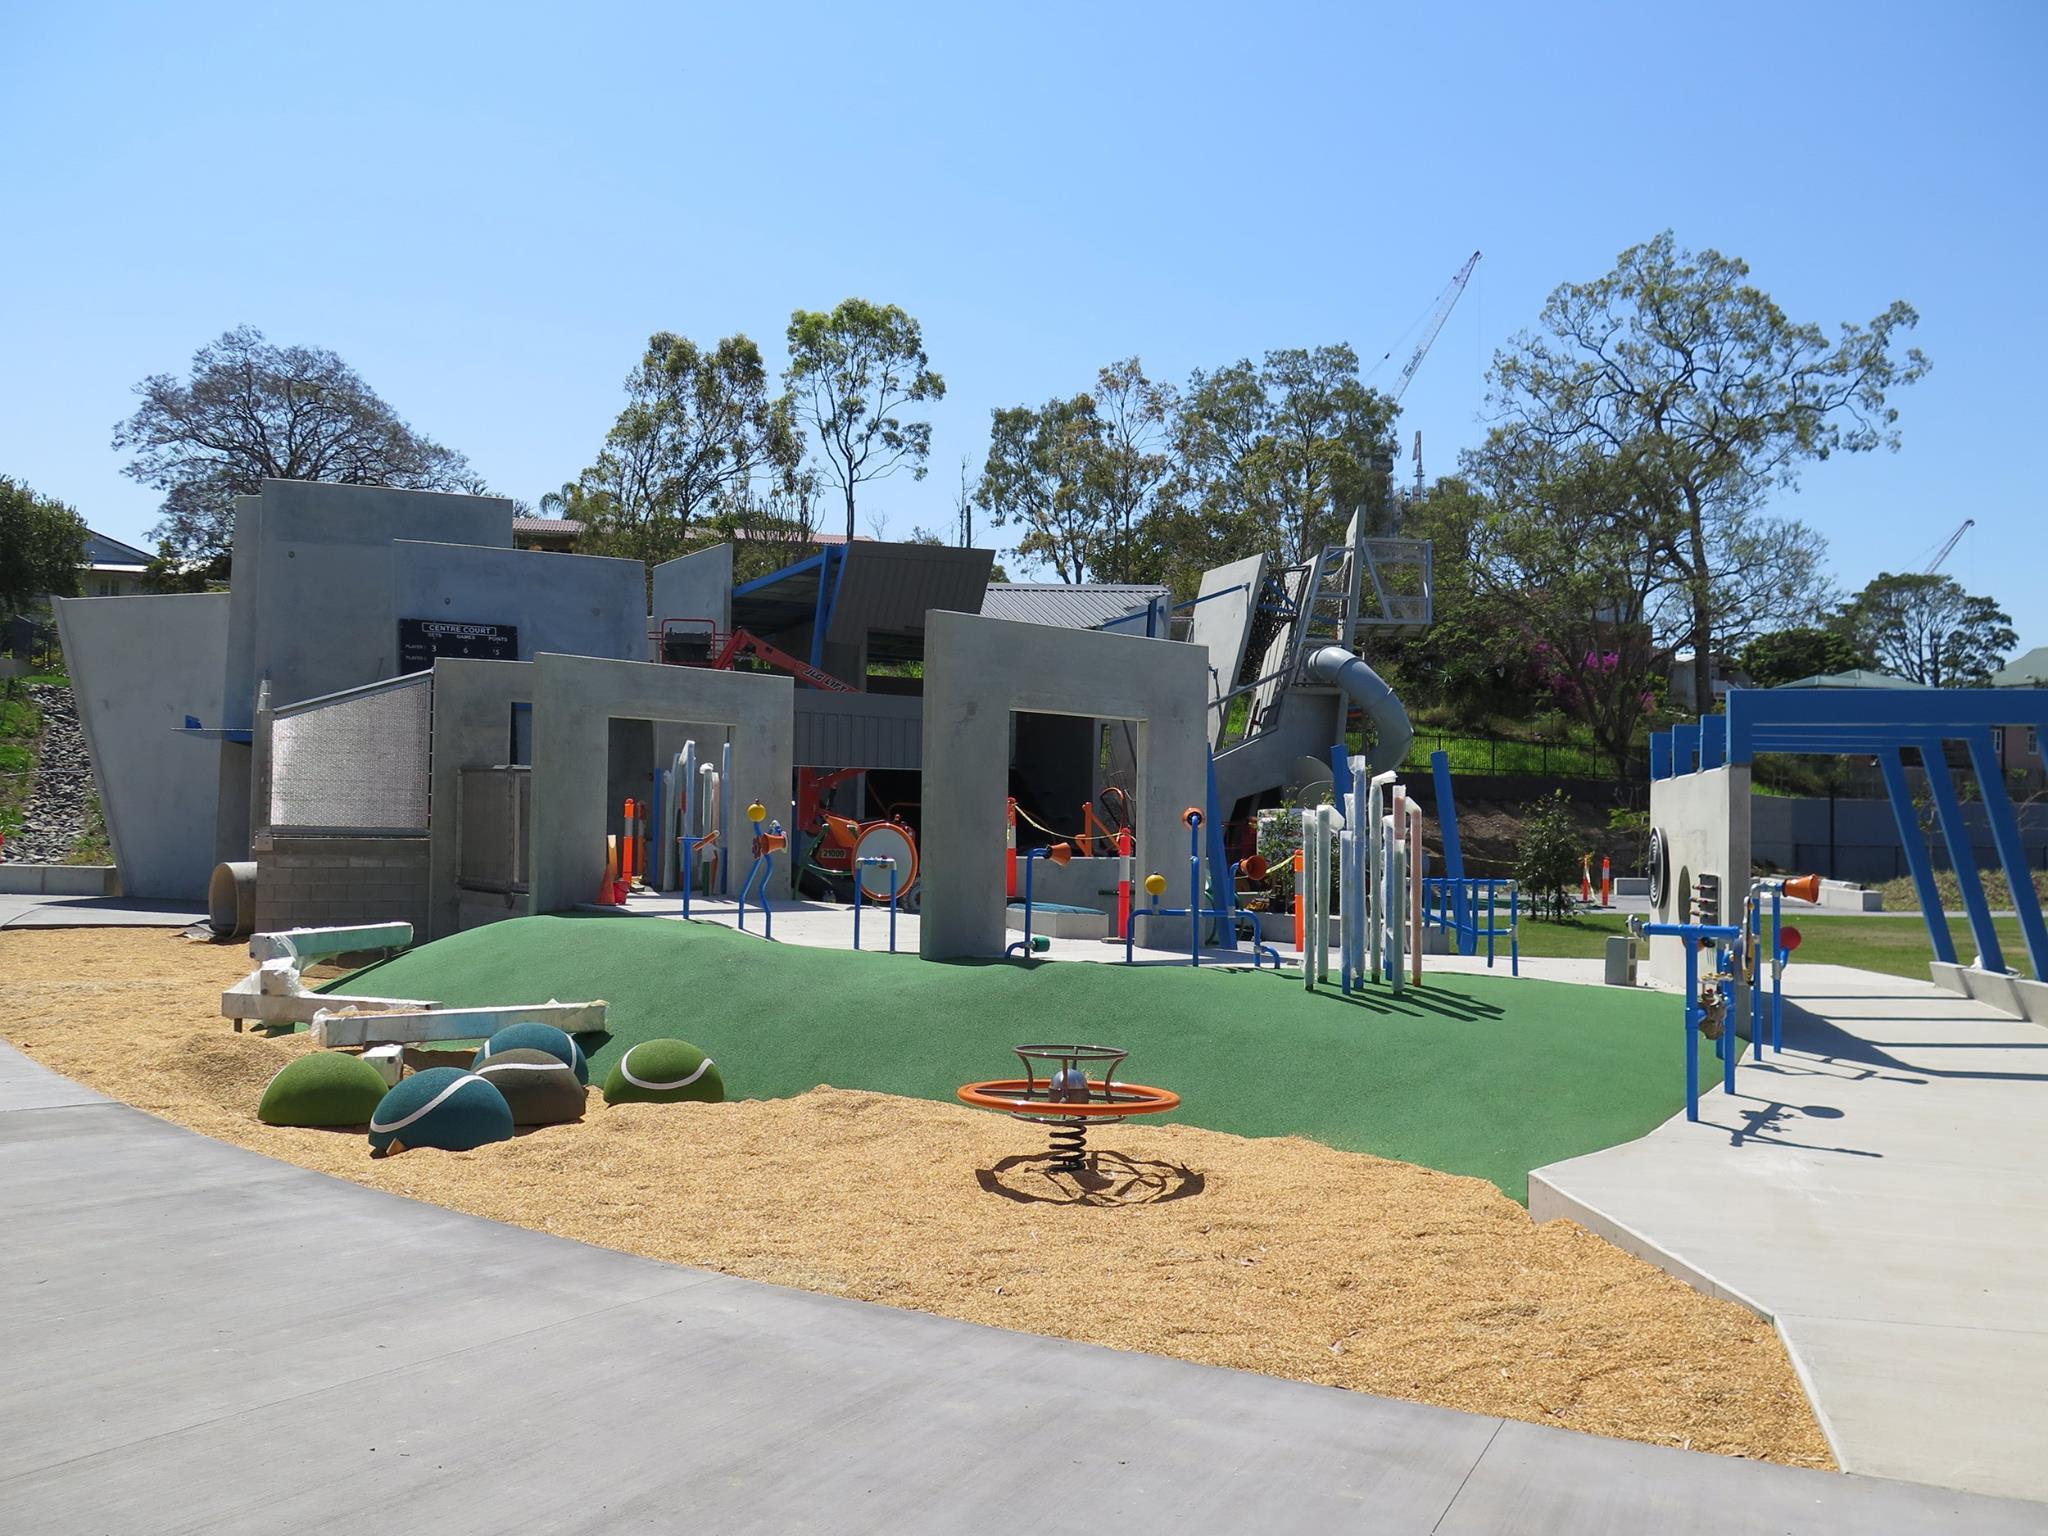 frew-park-playground-arena